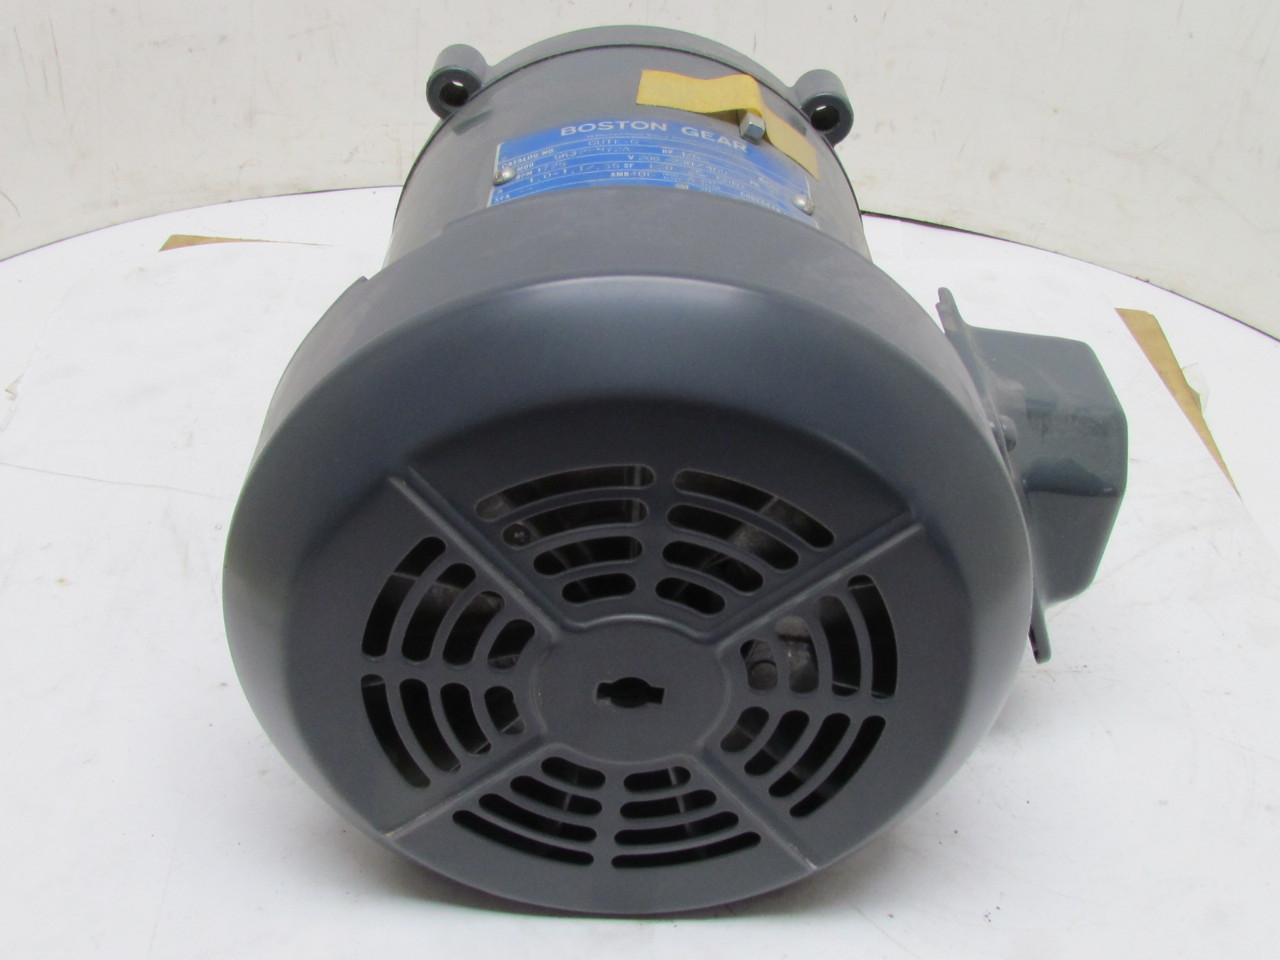 Boston gear 5k32en72a electric motor 1 6 hp 1725 rpm 3 ph for 1 rpm electric motor